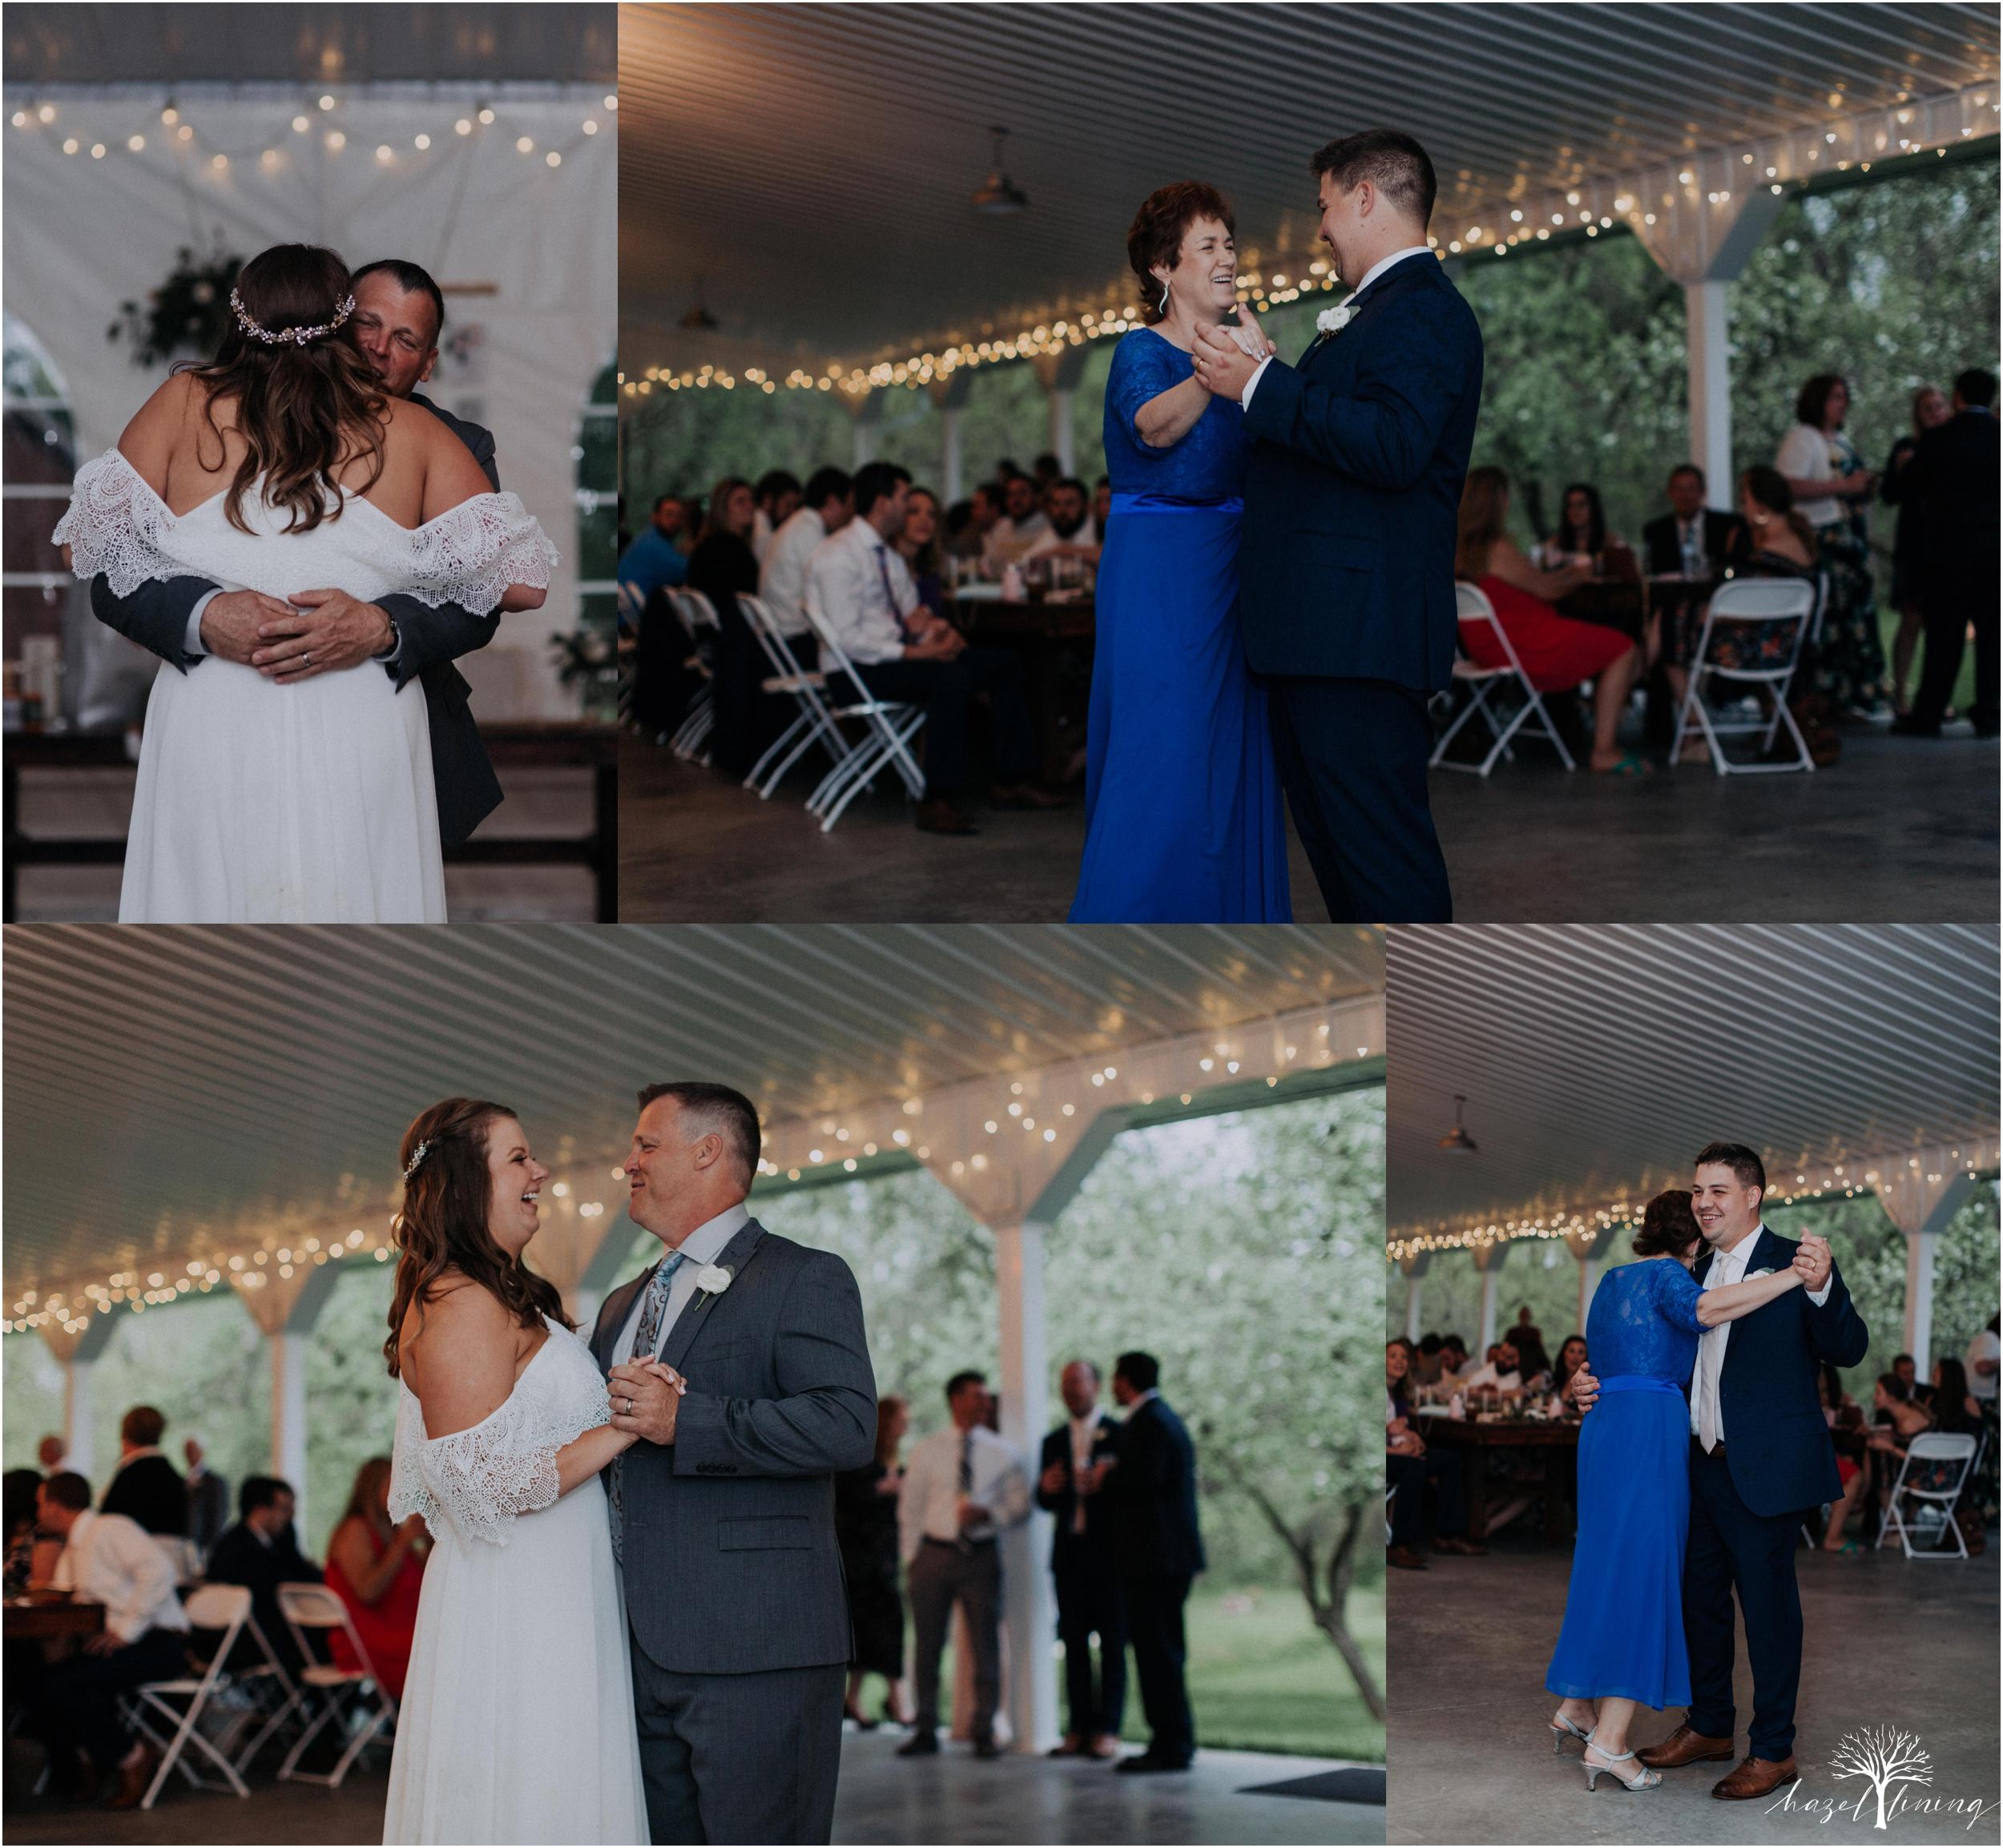 hazel-lining-travel-wedding-elopement-photography-abby-skyler-hunt-the-willis-house-york-pennsylvania-outdoor-estate-wedding_0143.jpg